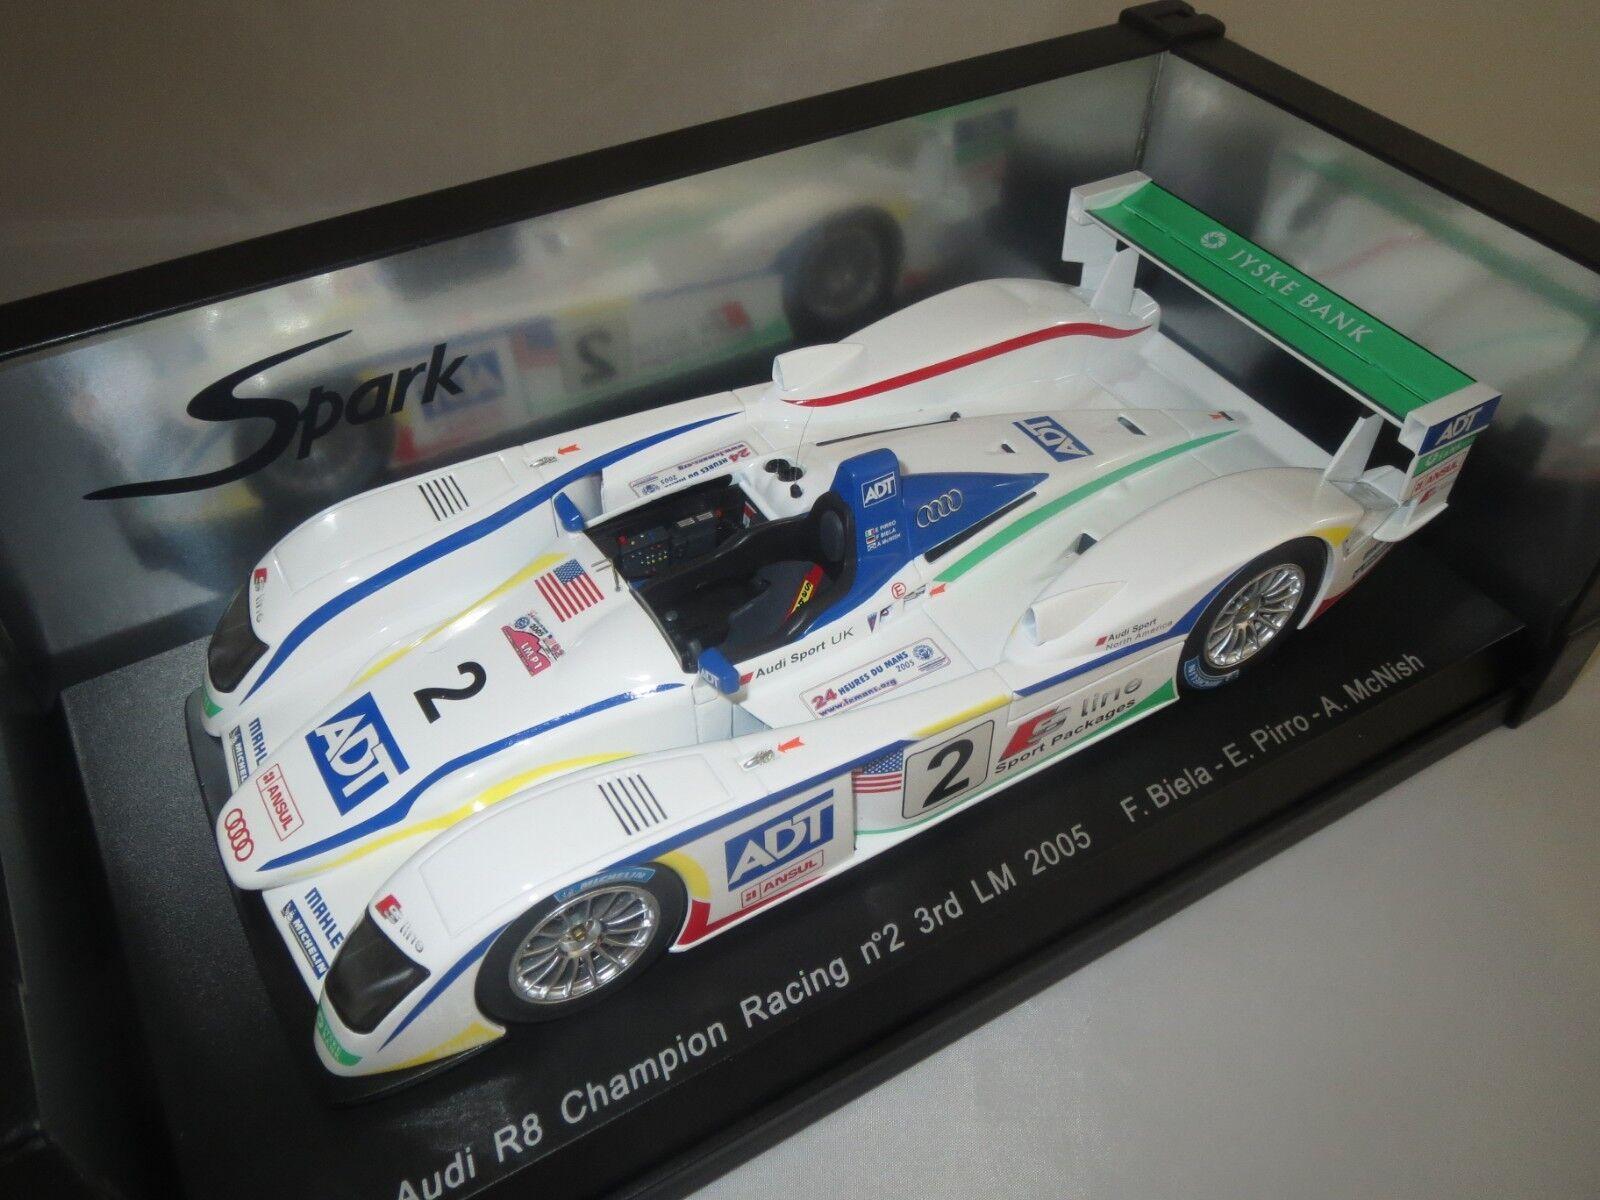 SPARKi r8 Champion Racing nº 2 3rd LM 2005 F. BIELA-E. Pirro-A. Mcnish 1 18 (1)